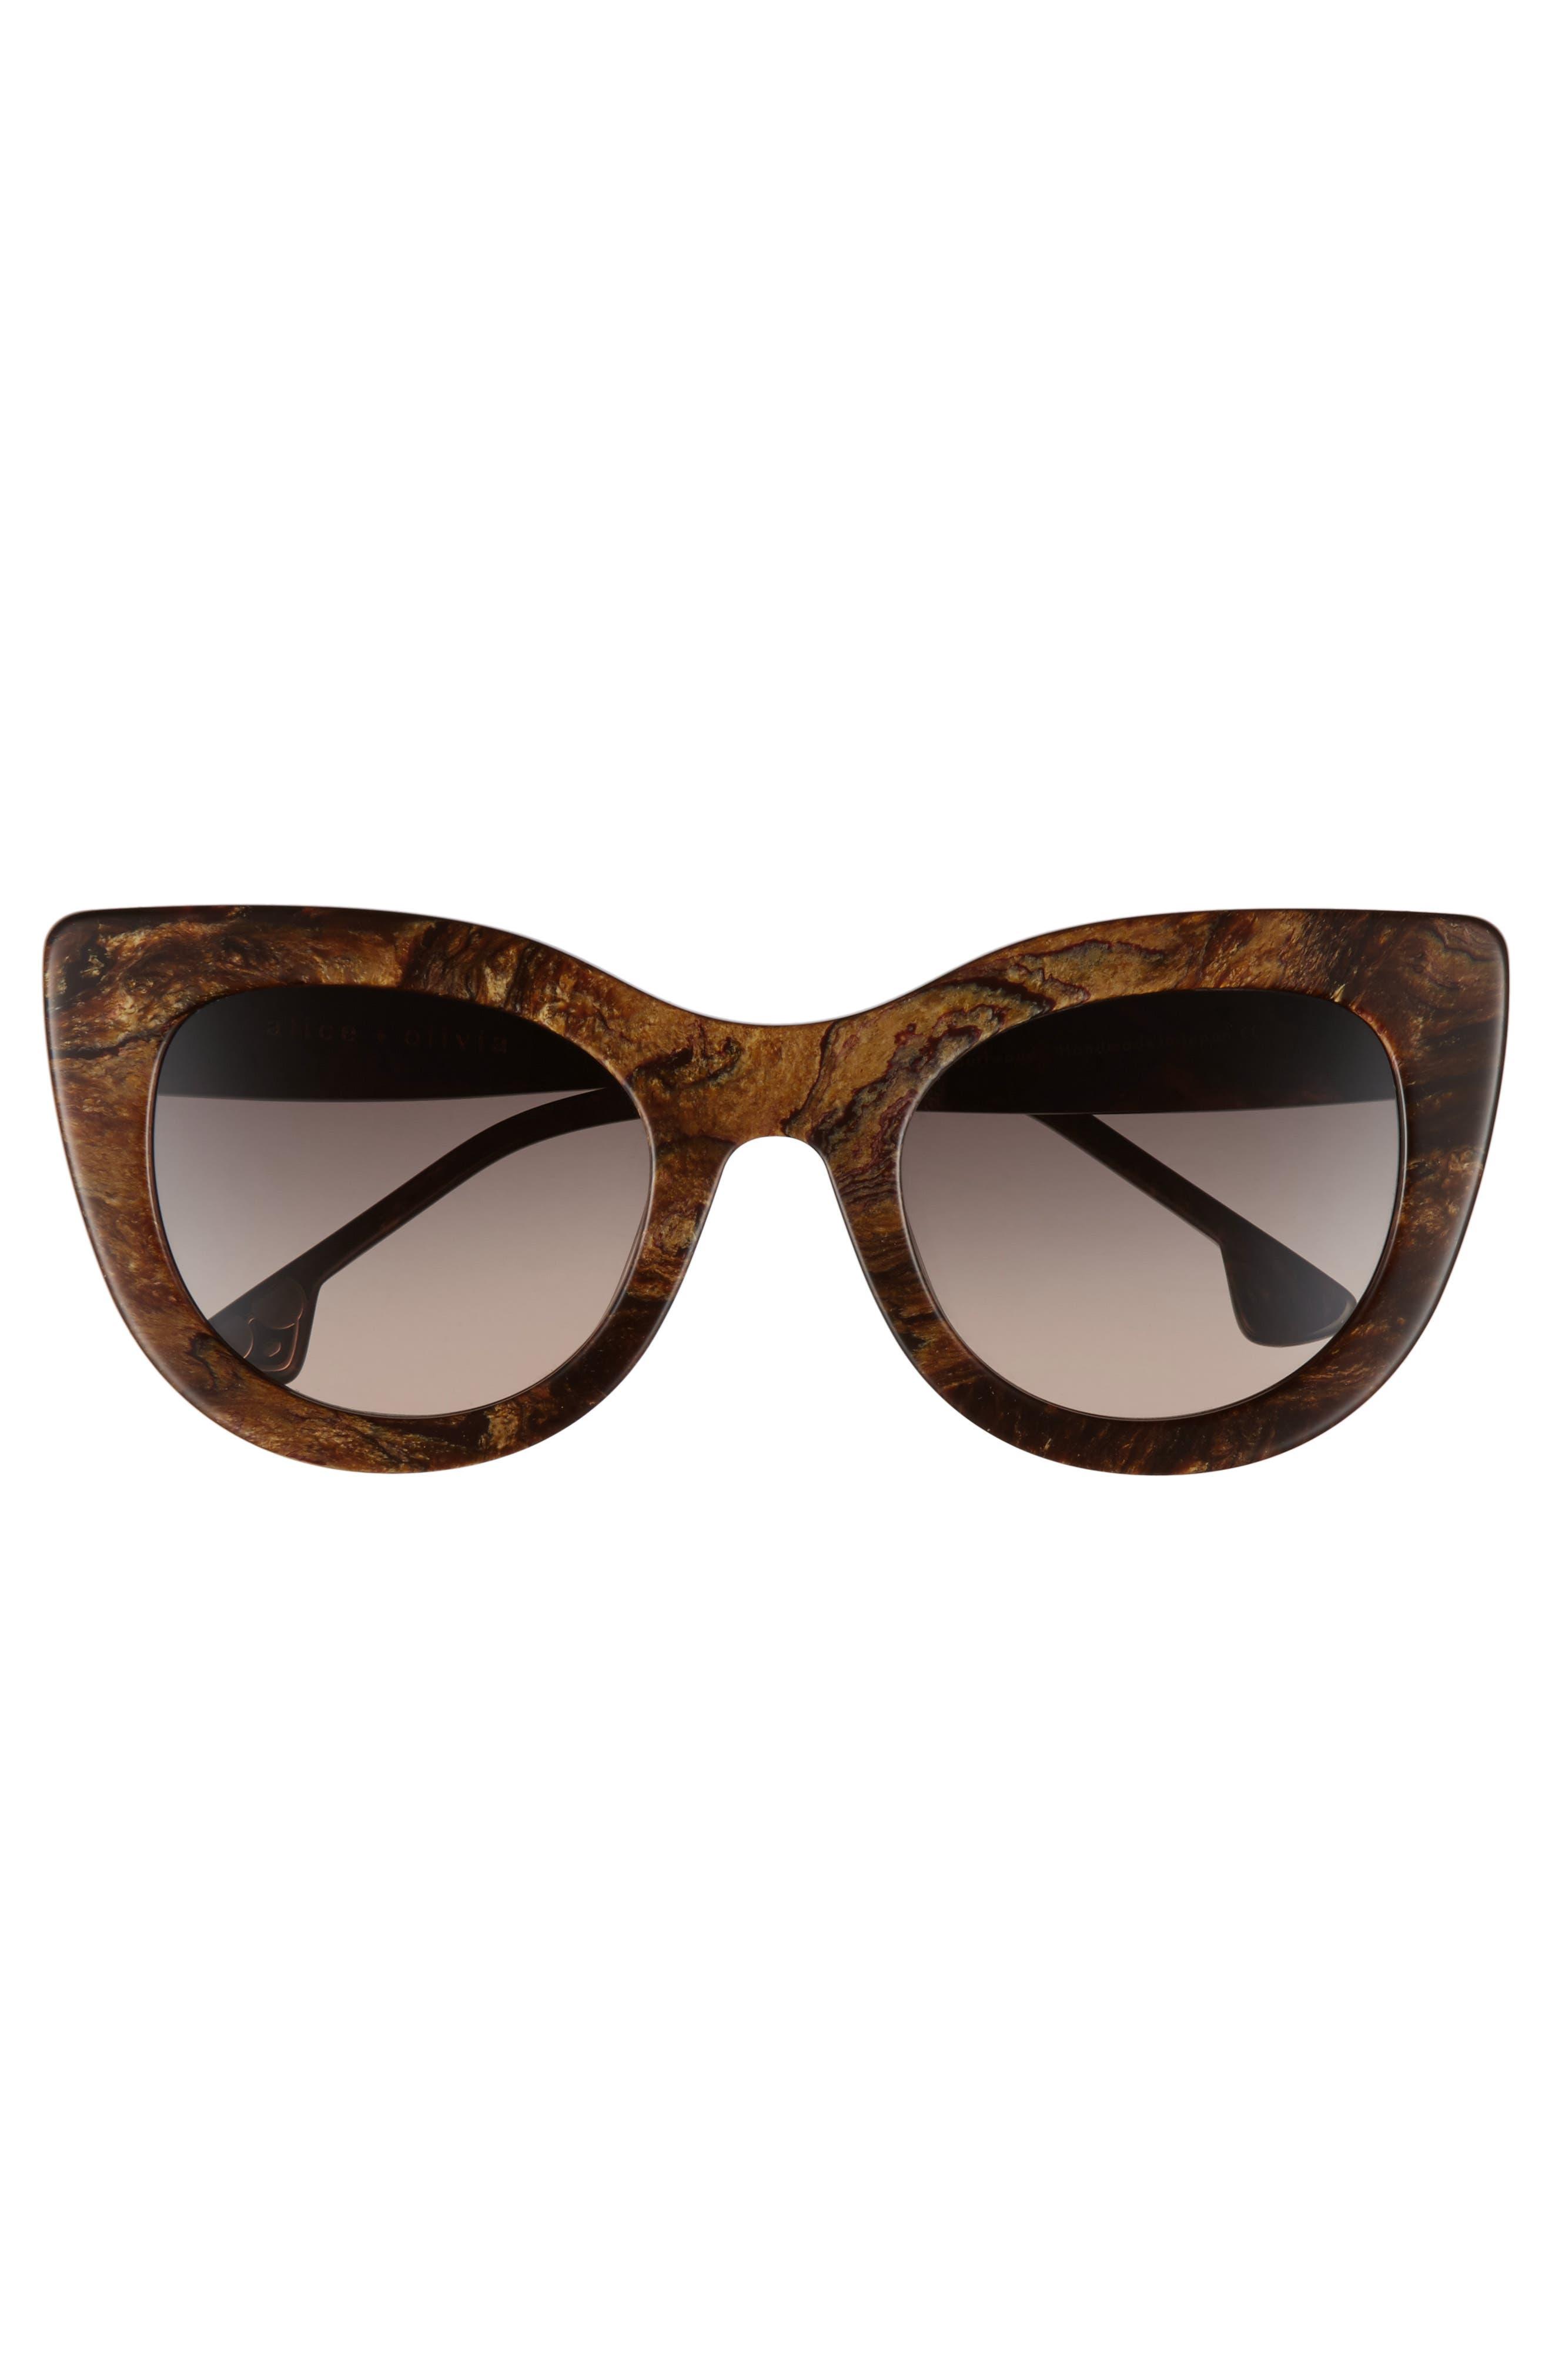 Delancey 51mm Cat Eye Sunglasses,                             Alternate thumbnail 6, color,